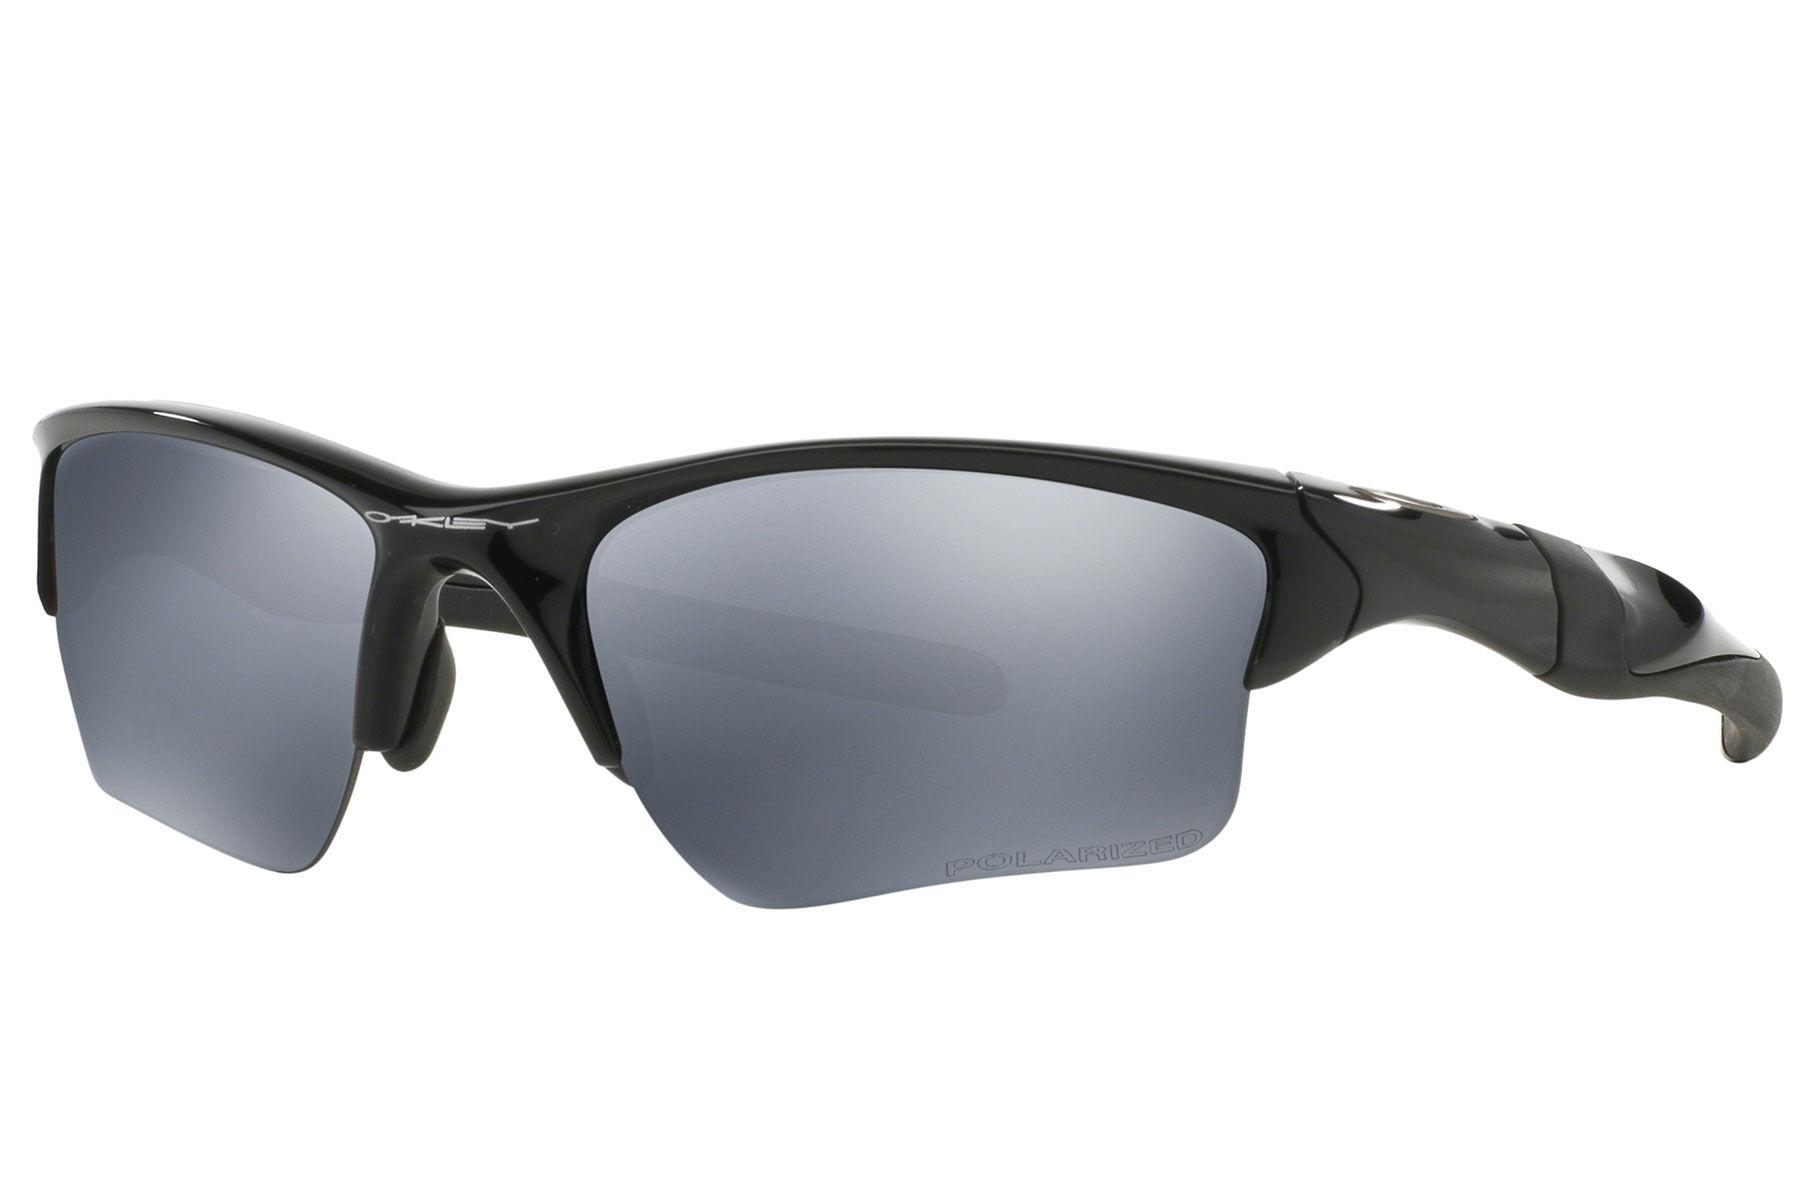 occhiali oakley xl